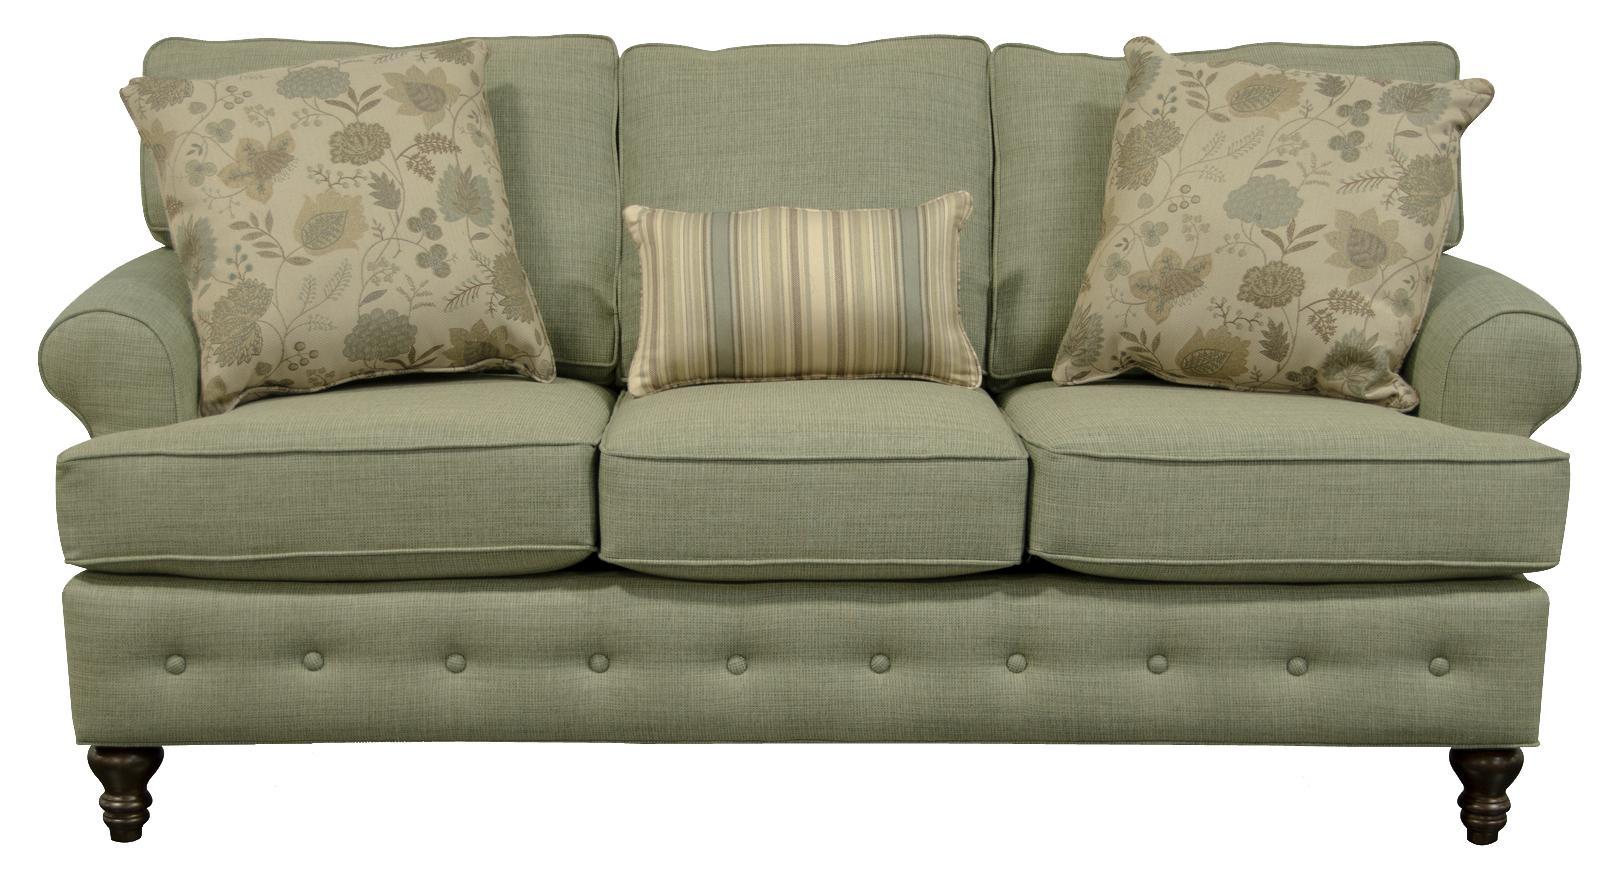 England Evans Living Room Sofa - Item Number: 8485 Toluca Sea